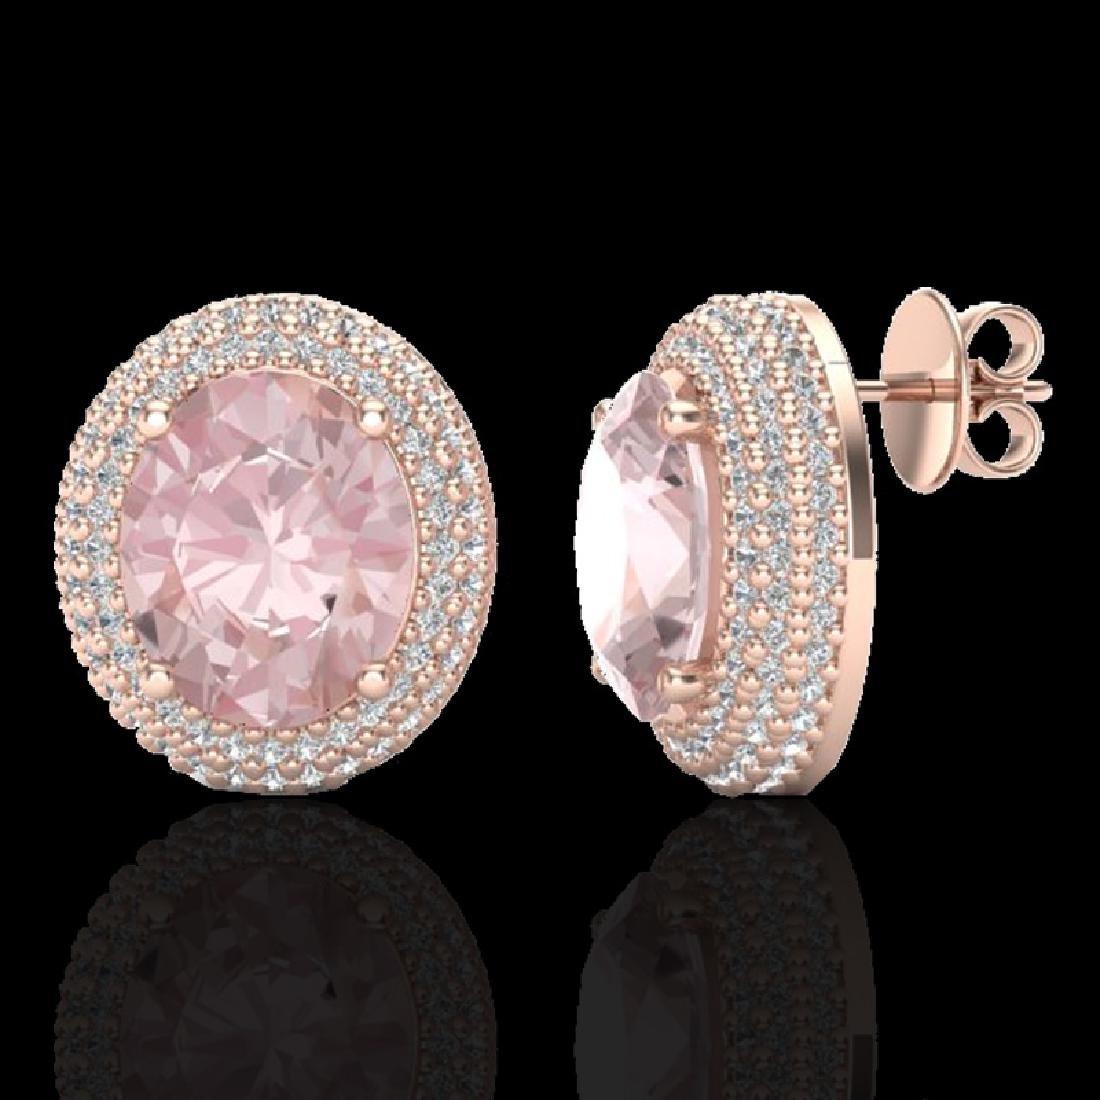 9 CTW Morganite & Micro Pave VS/SI Diamond Earrings 14K - 2